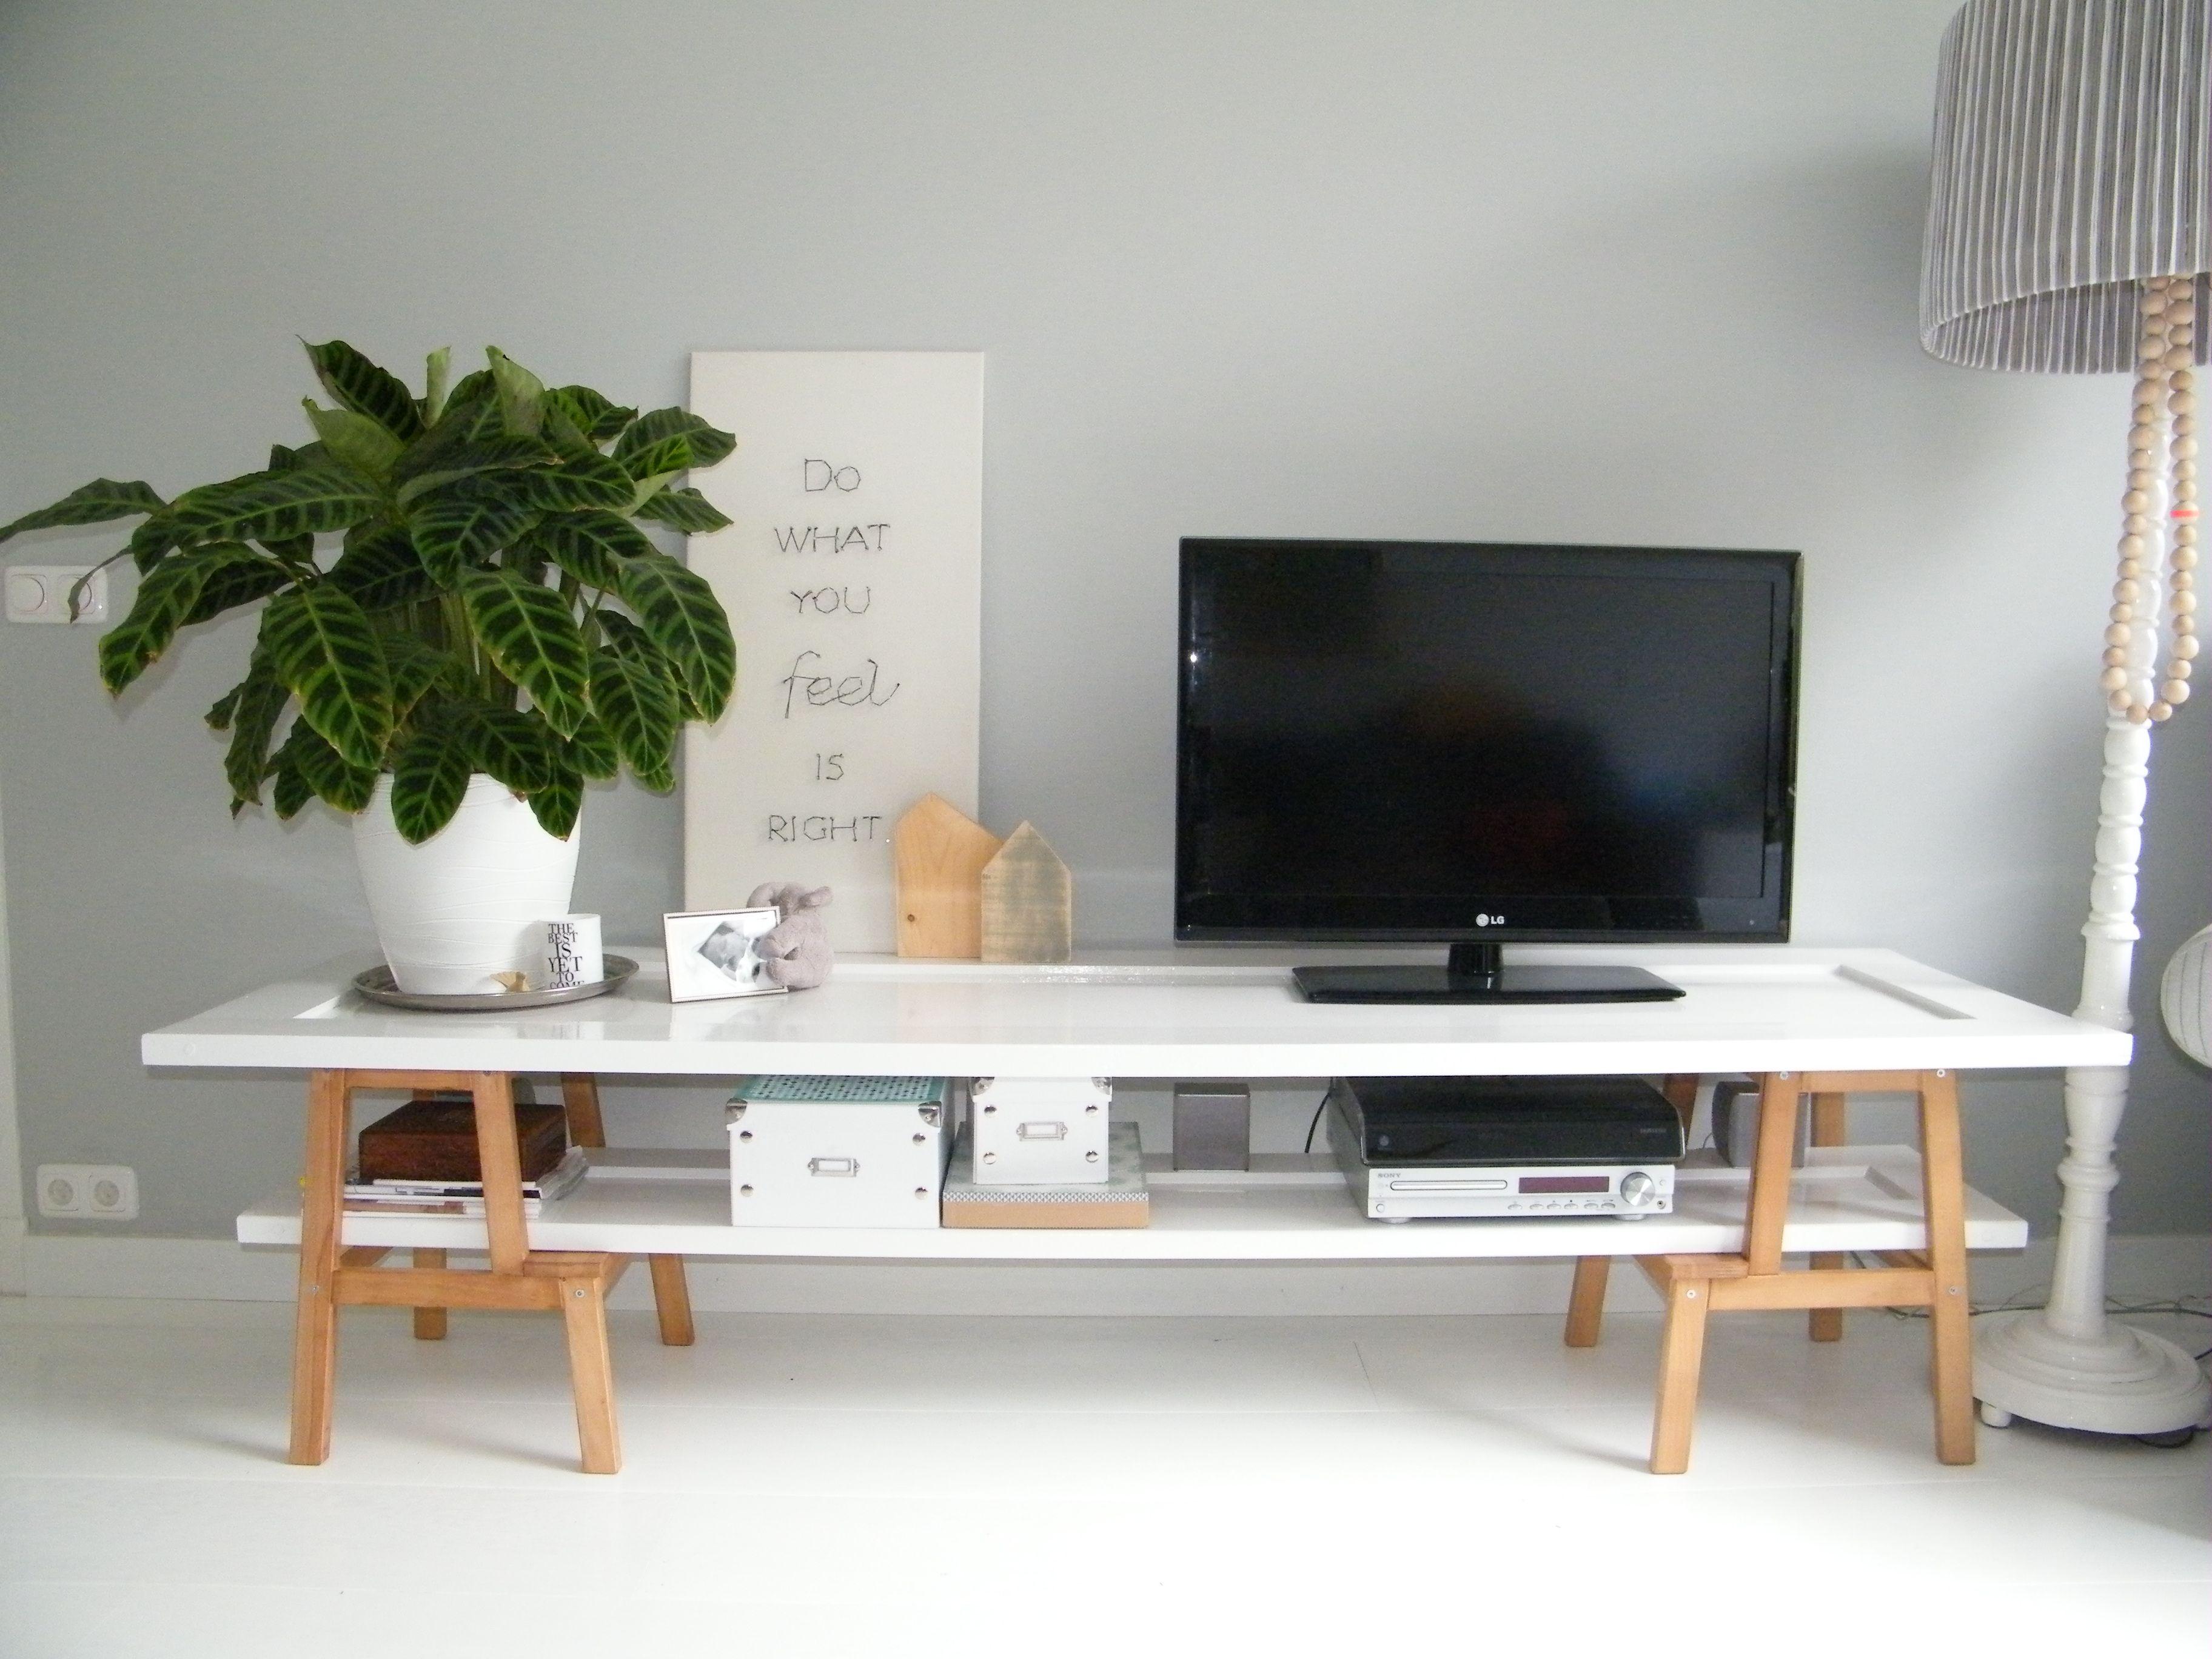 ikea hack ikea bekv m stereobenk my little carstle diy pinterest bekv m ikea und wohnzimmer. Black Bedroom Furniture Sets. Home Design Ideas